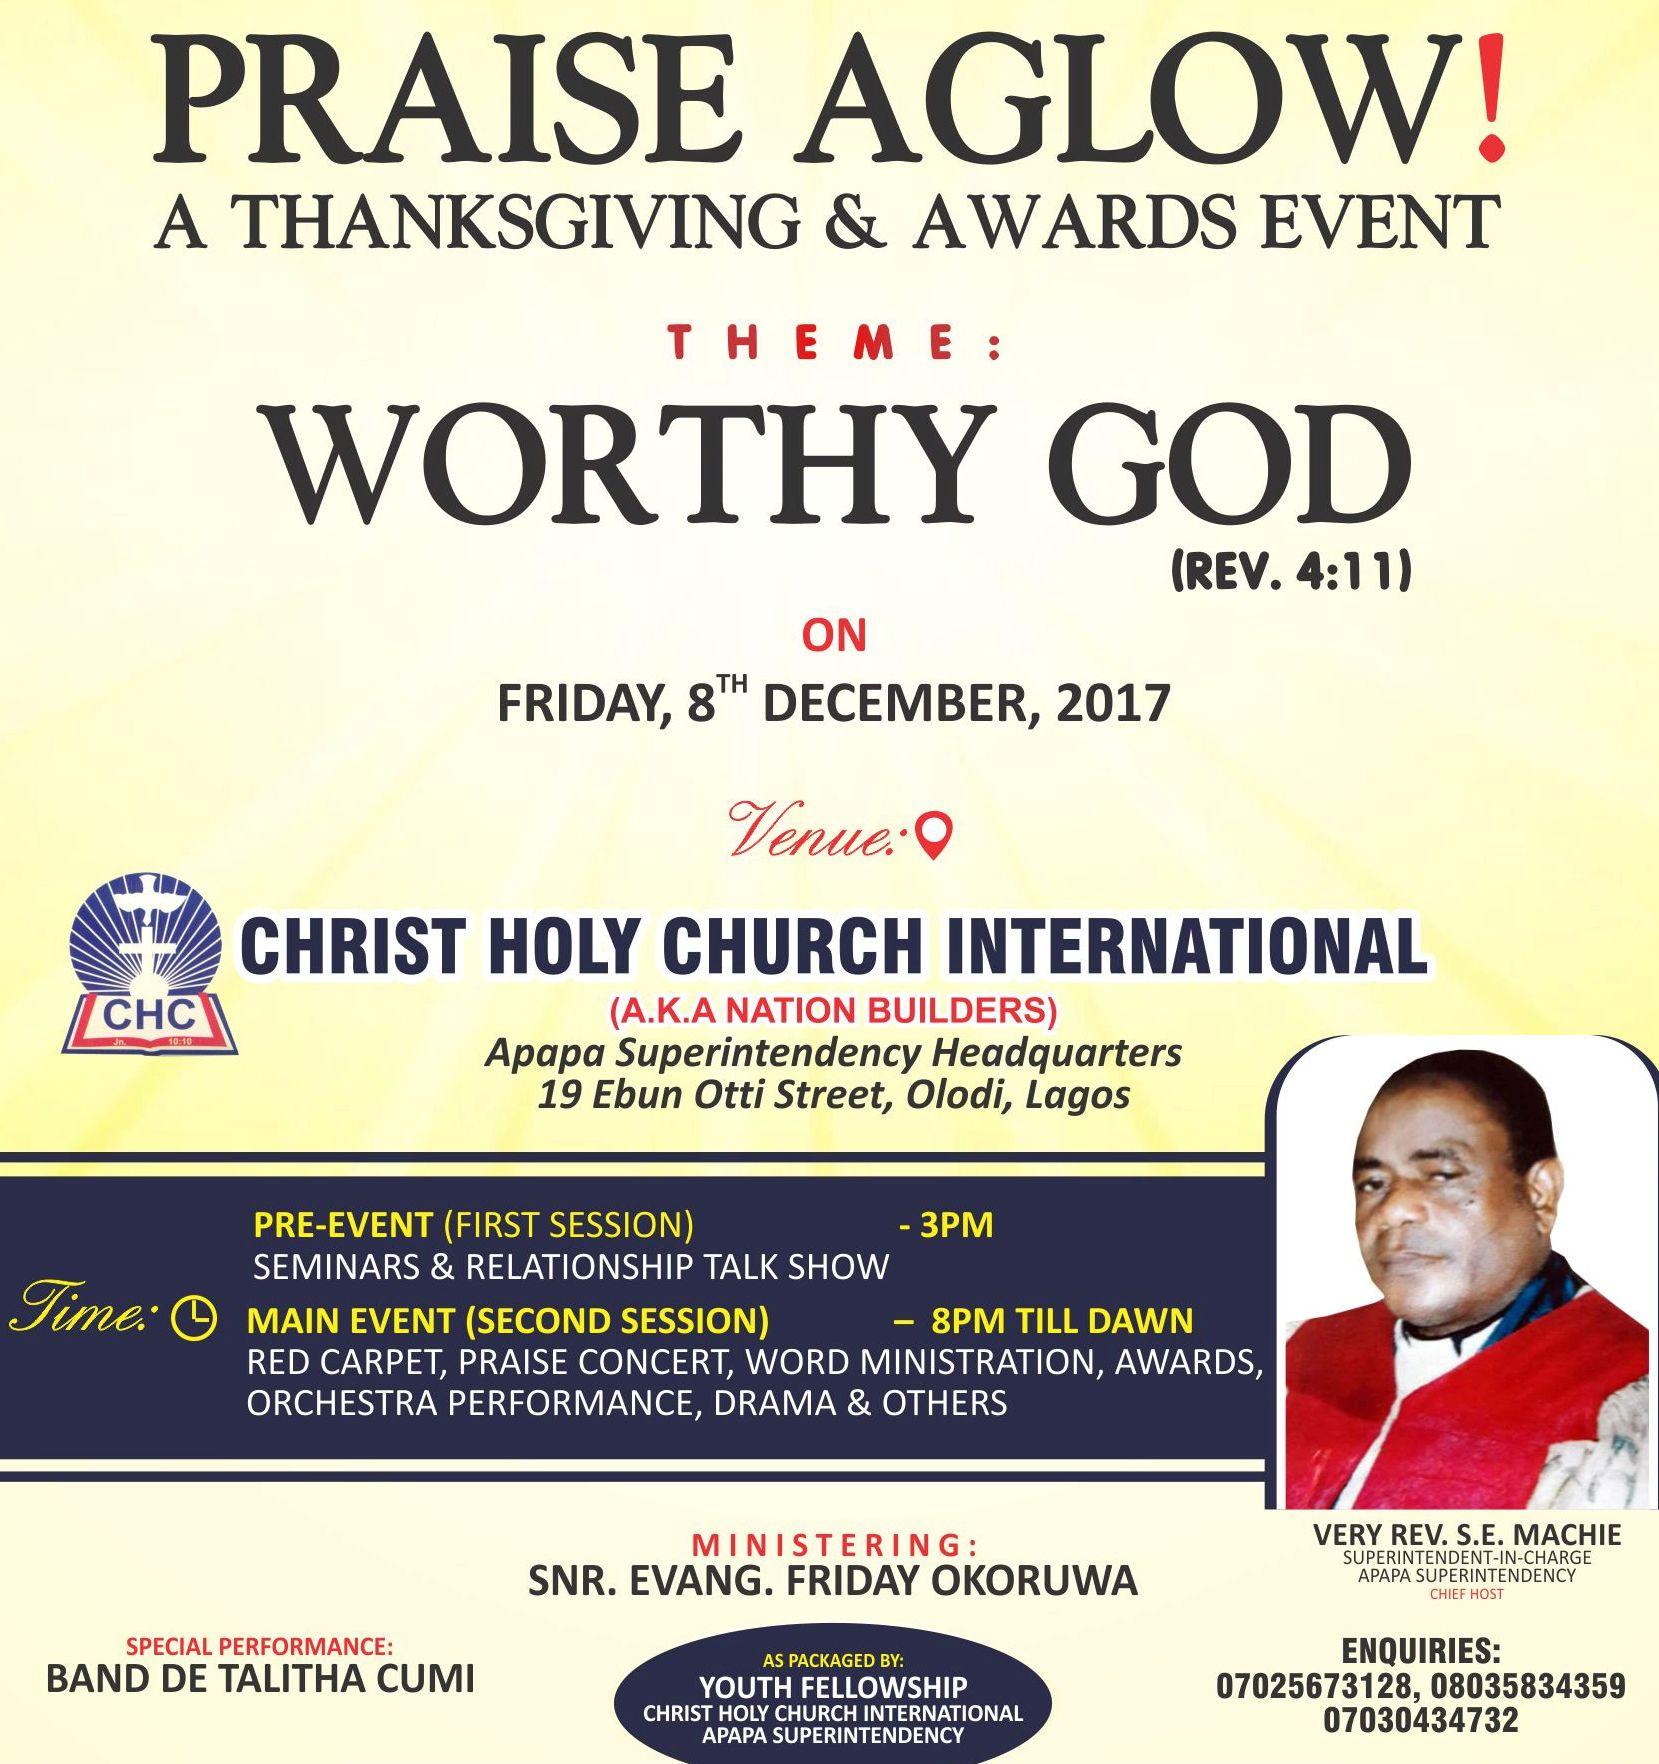 PRAISE AGLOW - A THANKSGIVING & AWARDS EVENT